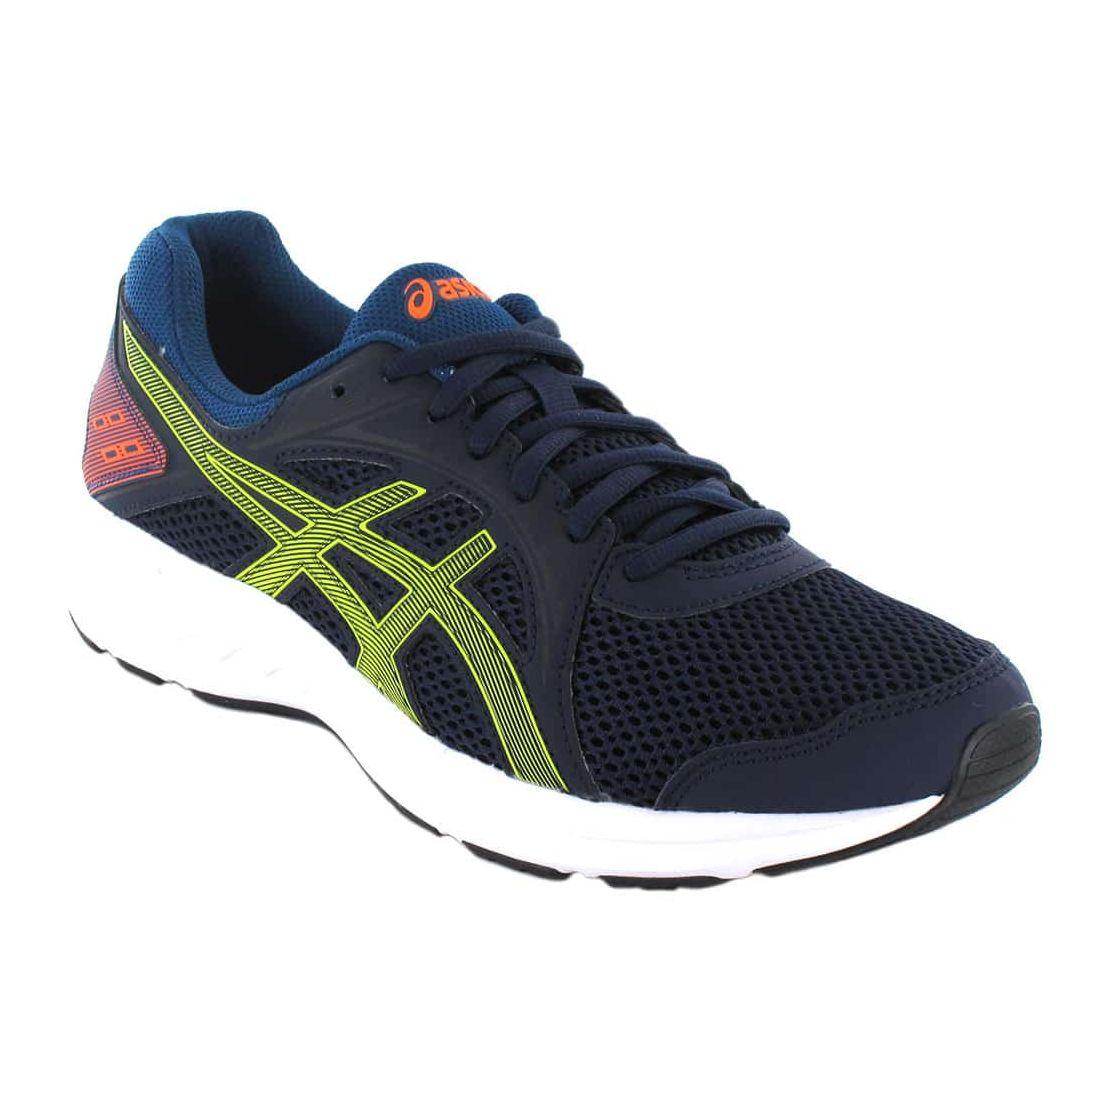 Asics Jolt 2 Navy Blue Asics Mens Running Shoes Running Shoes Running Sizes: 40,5, 41,5, 42, 43,5, 44, 44,5